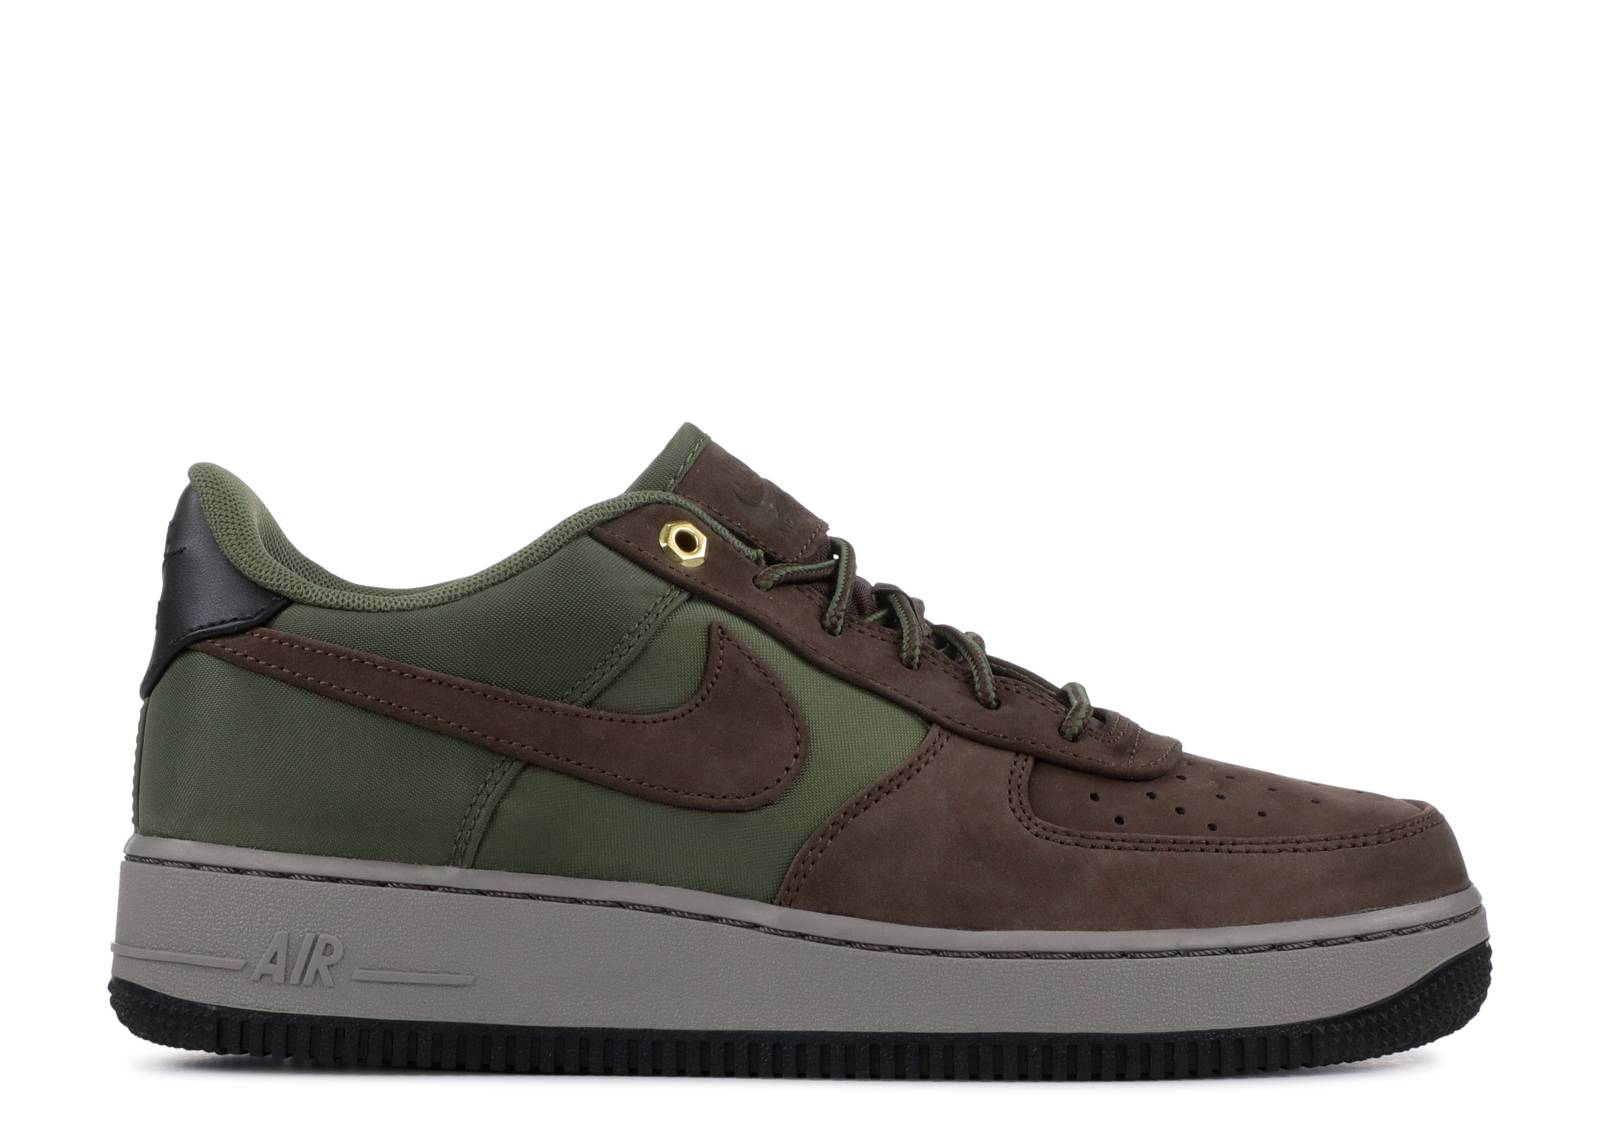 6578e3357f Nike Air Force 1 Premier (gs) - Nike - av5251 200 - baroque brown ...